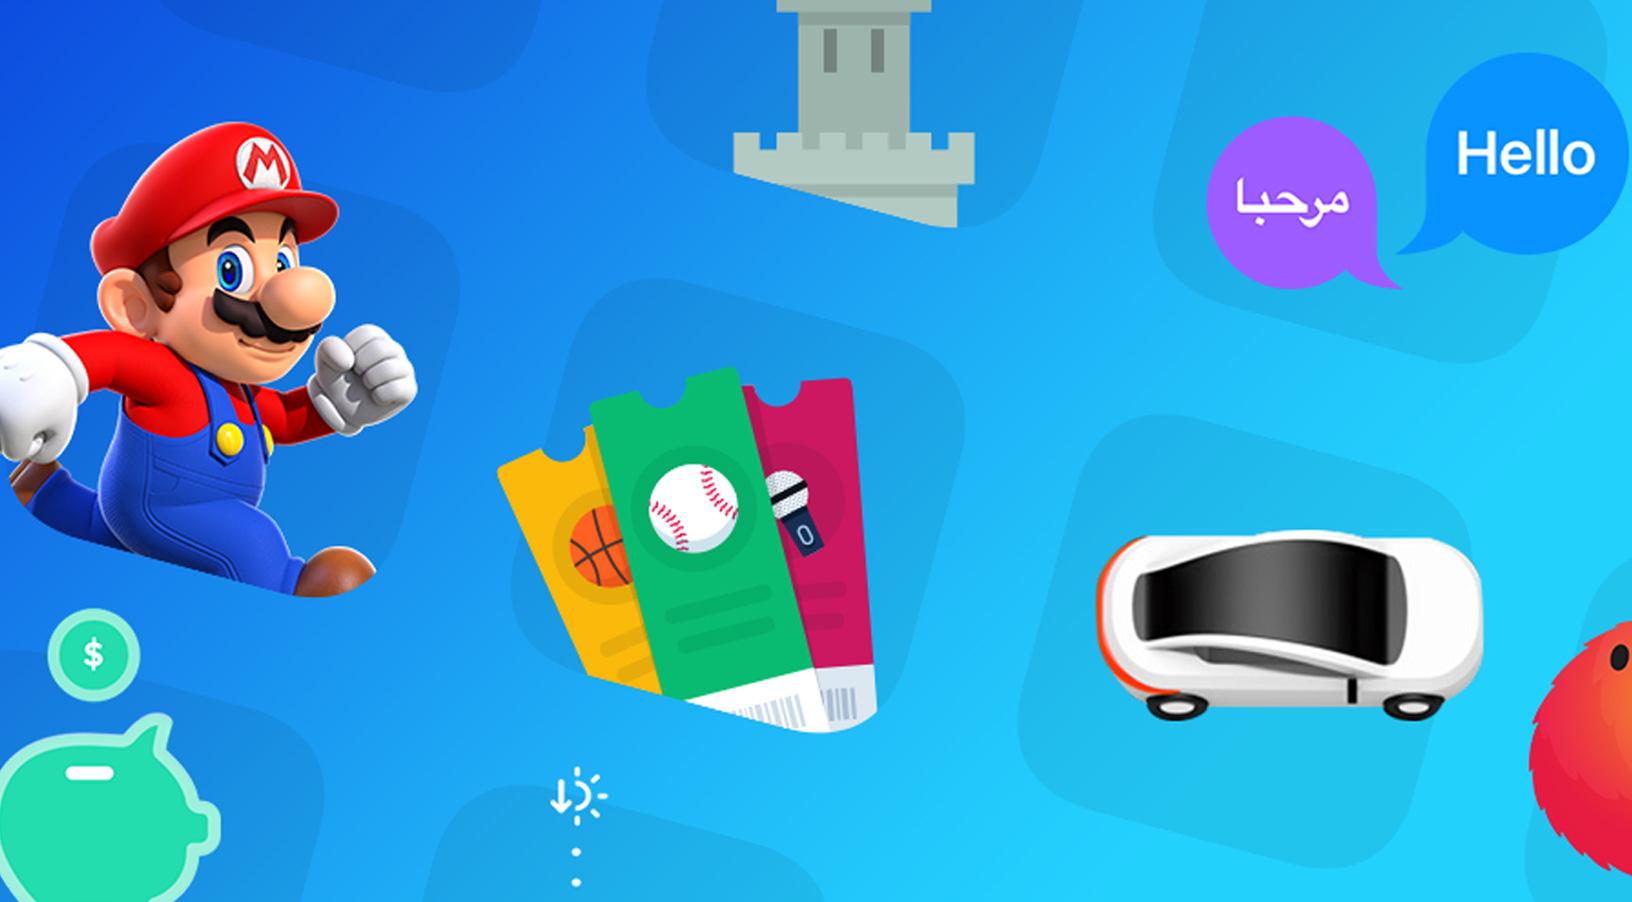 App Store에서 발생한 개발자 수익 700억 달러 돌파